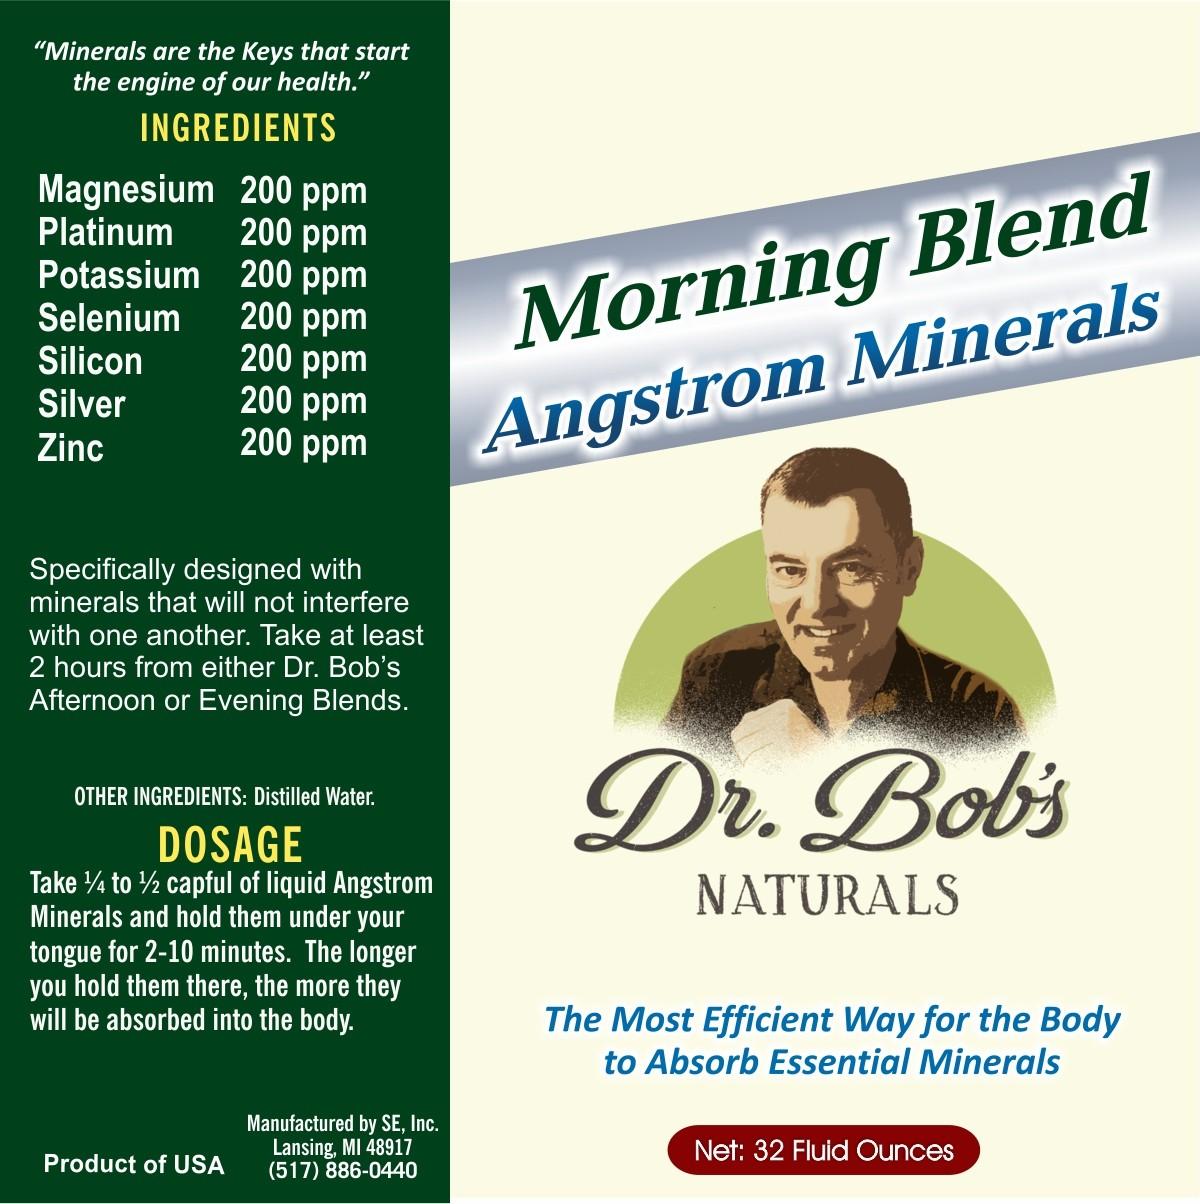 Angstrom Minerals - Morning Blend